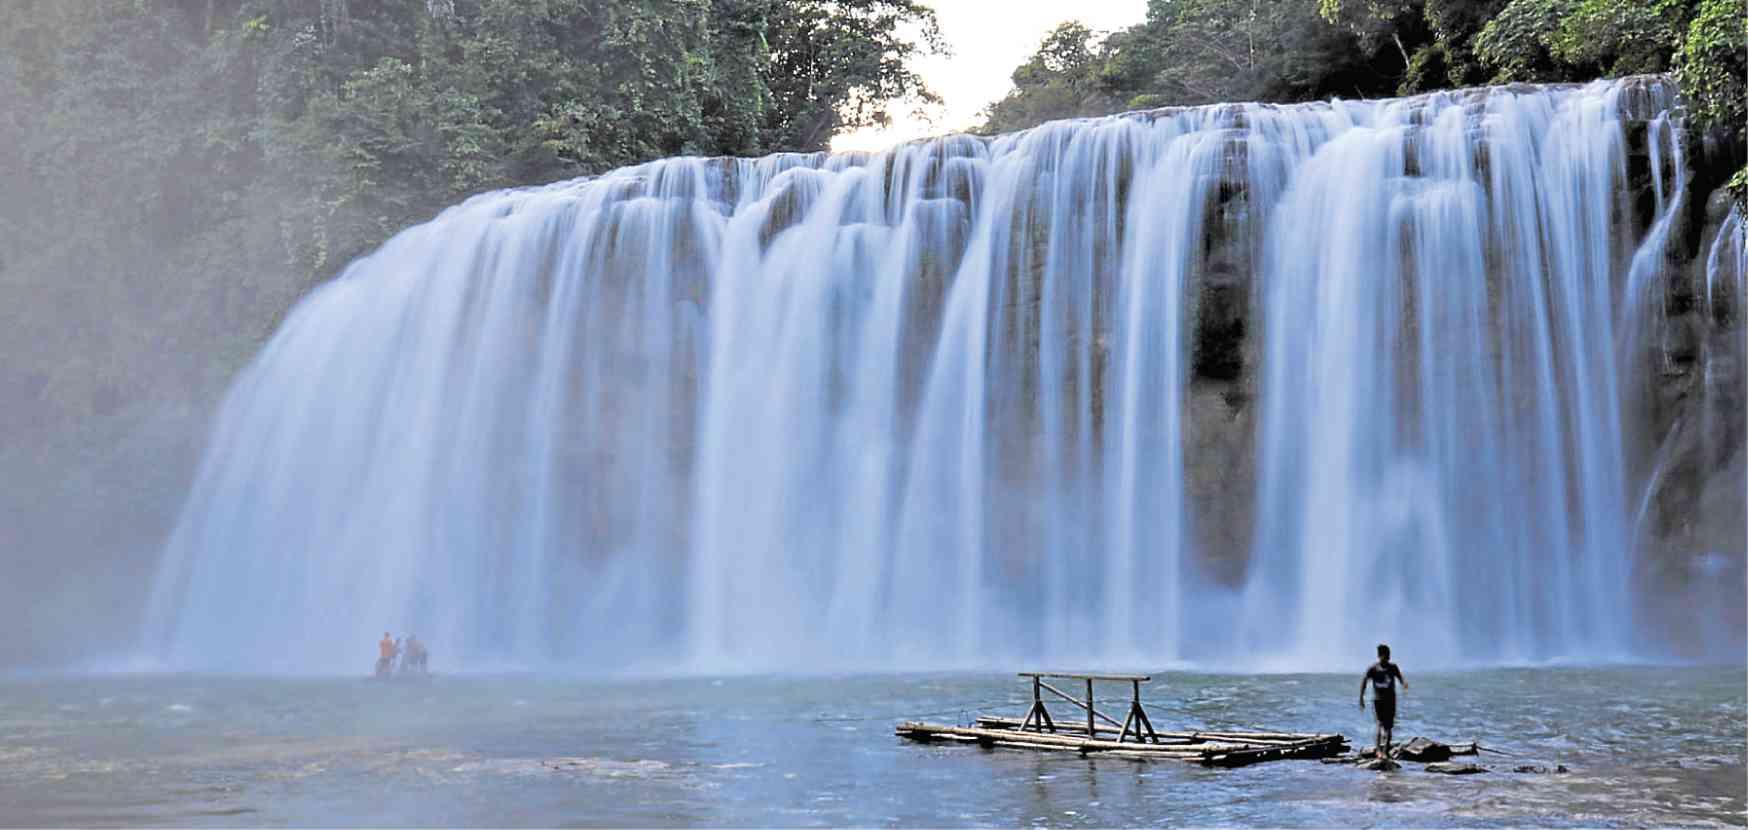 Surigao del Surs Little Niagara welcomes tourists again